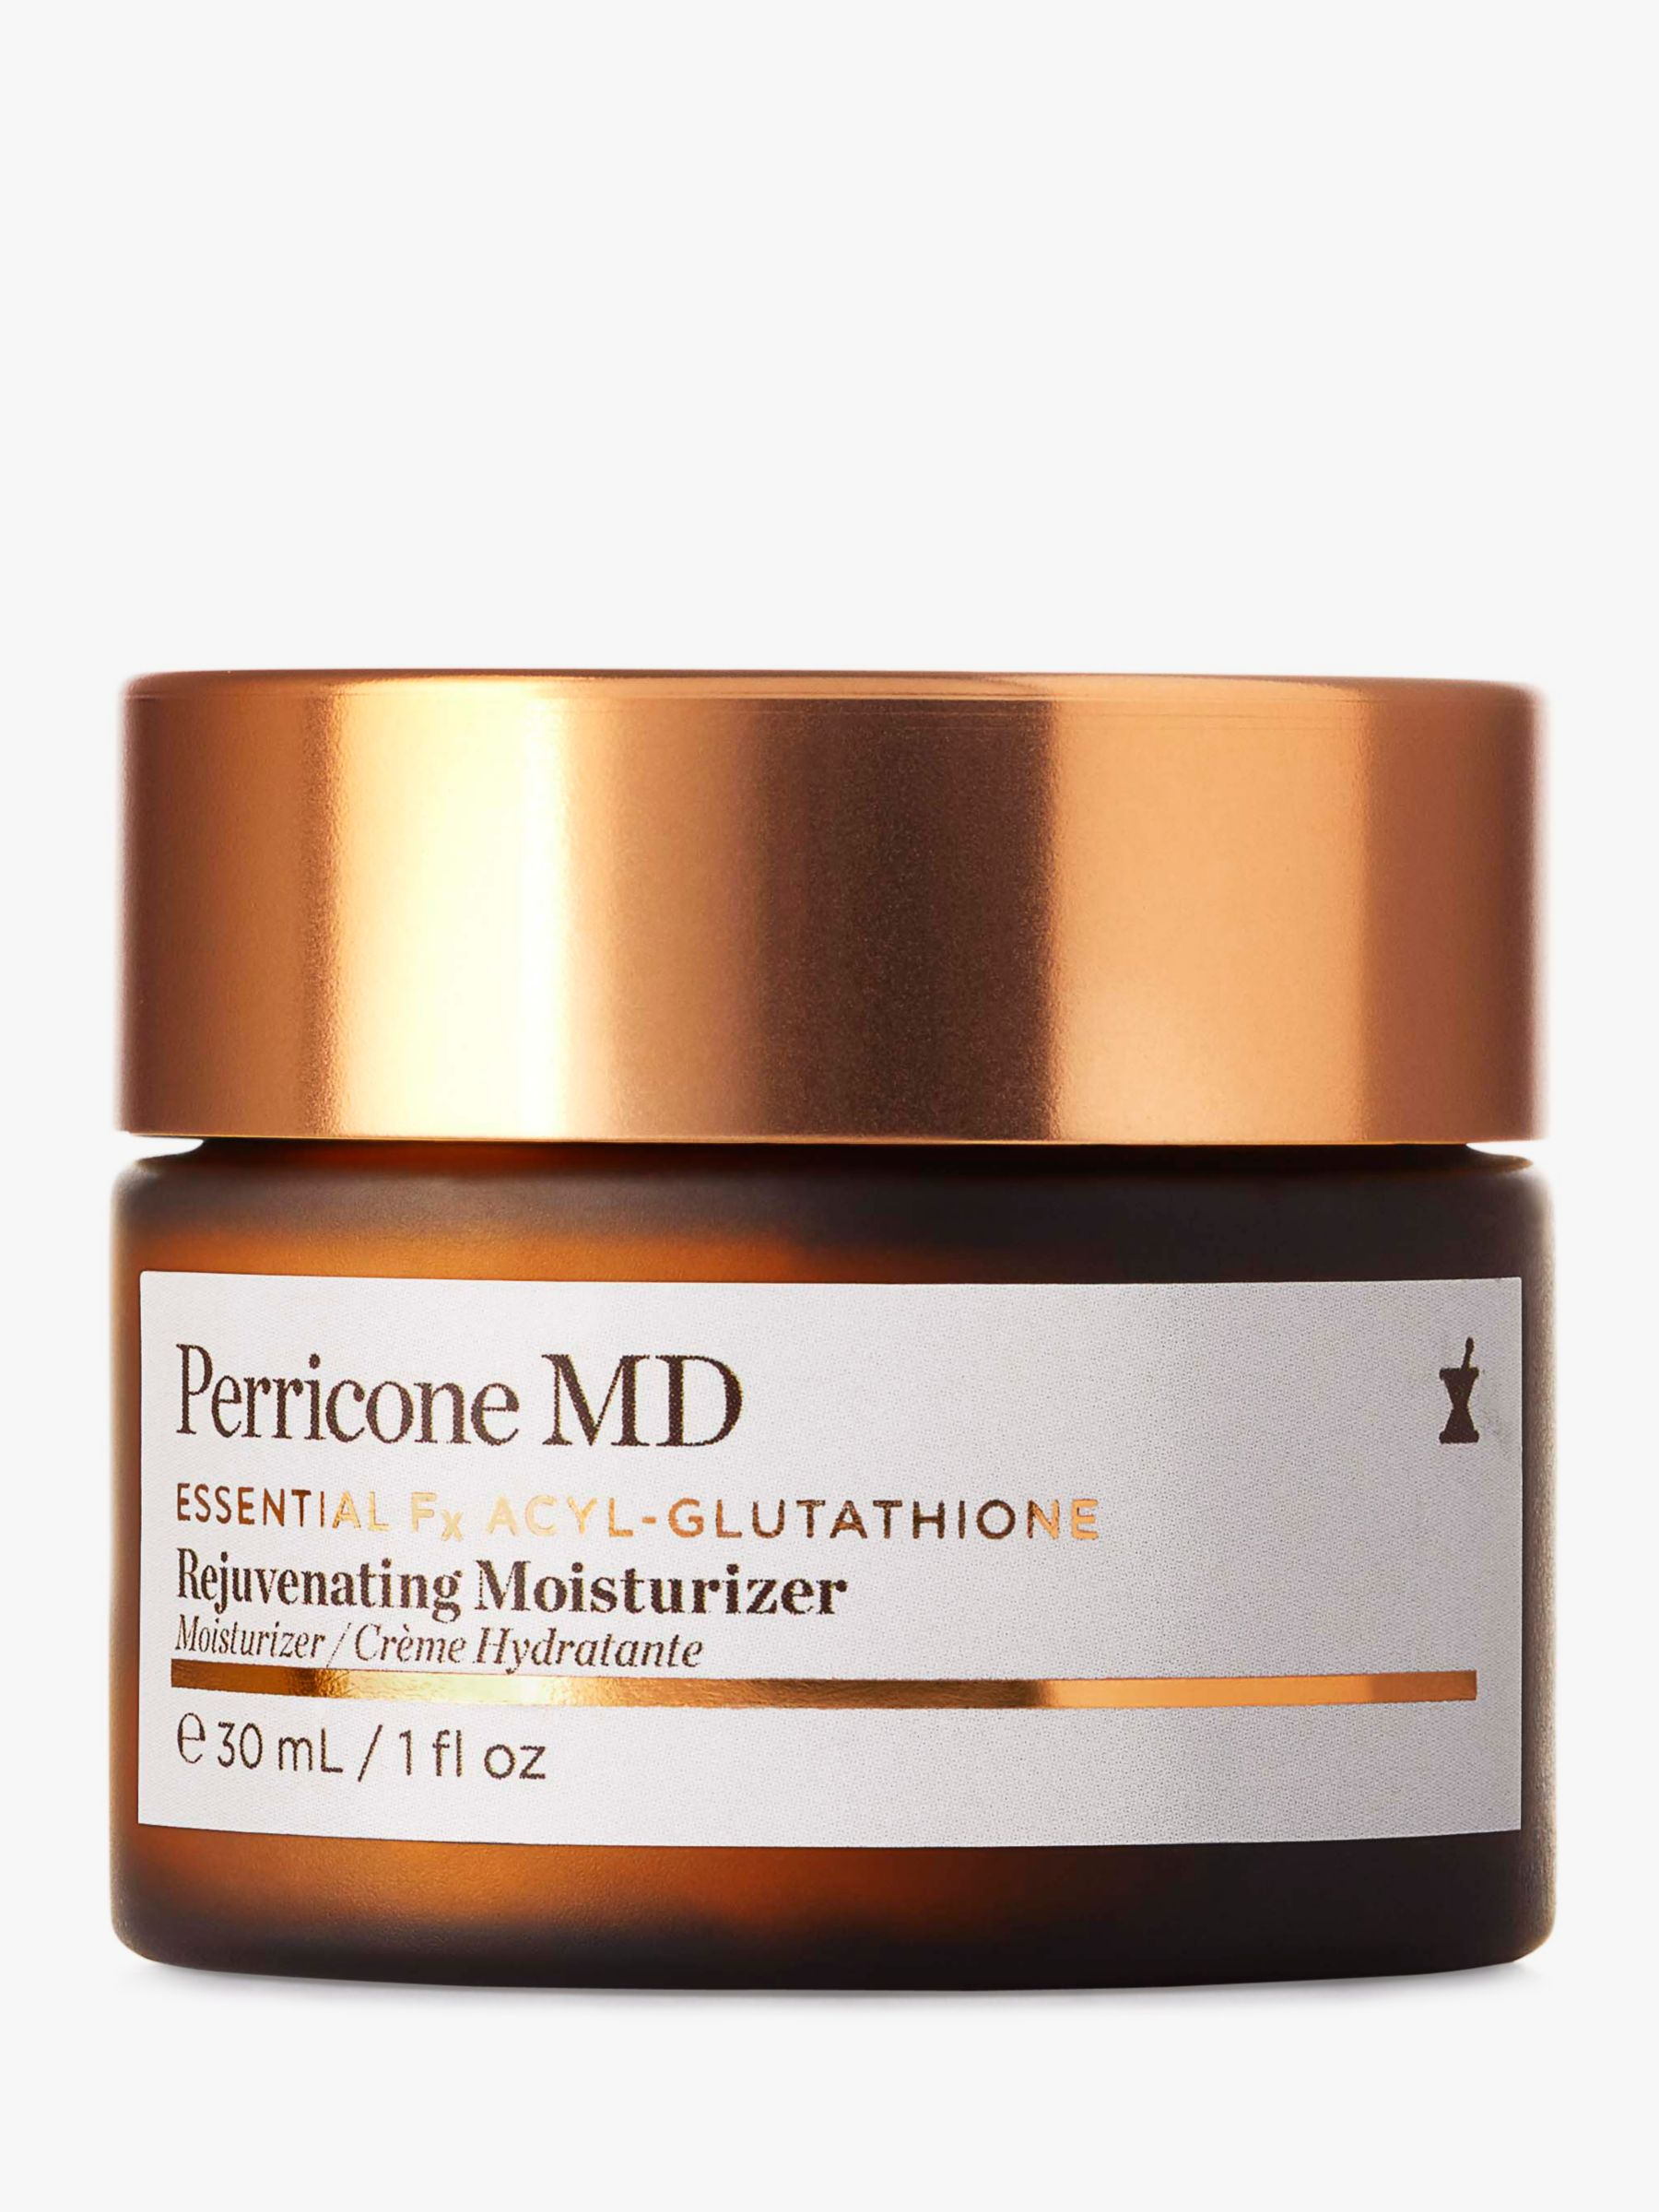 Perricone MD Perricone MD Essential Fx Acyl-Glutathione Rejuvenating Moisturiser, 30ml